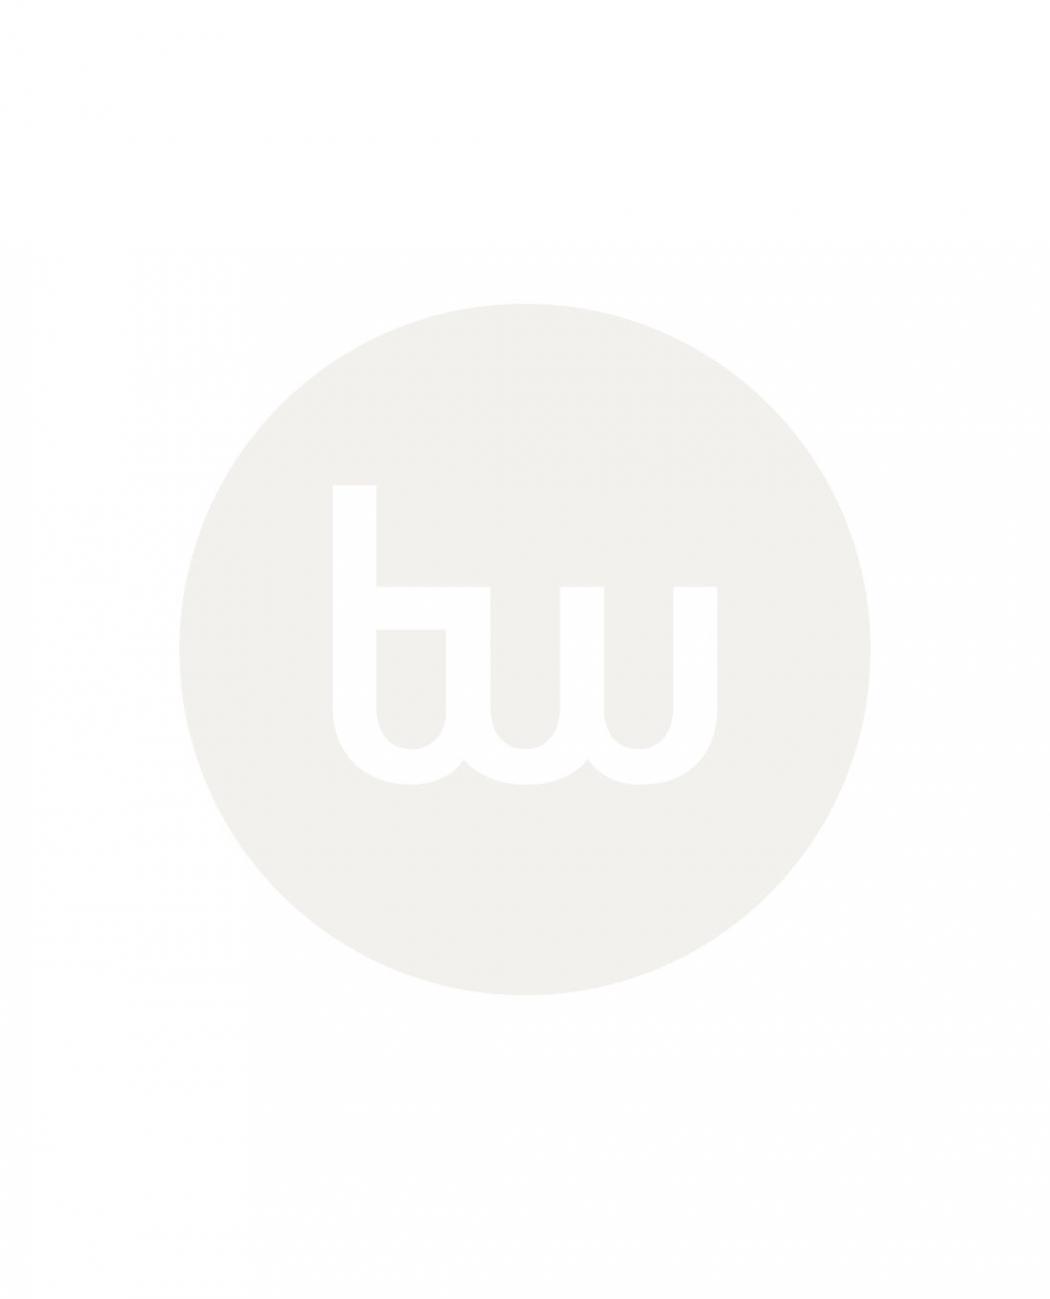 Oakley SI Ballistic Halo Matte Black / Grey - TACWRK